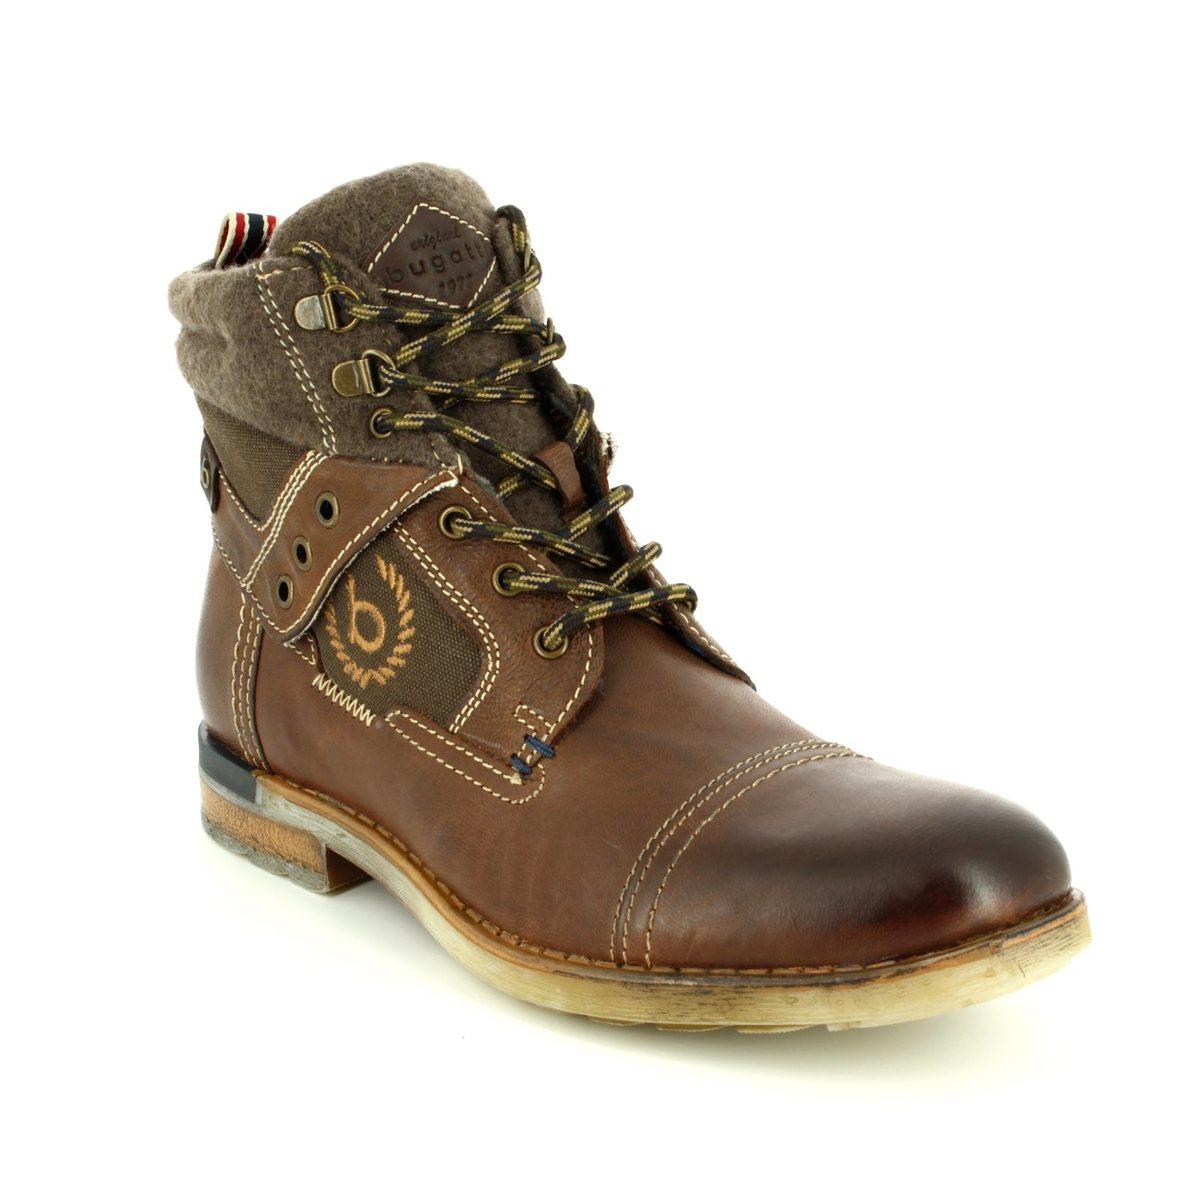 shoes for cheap free delivery wholesale sales Bugatti Sub Evo 33630-6161 Dark Brown boots